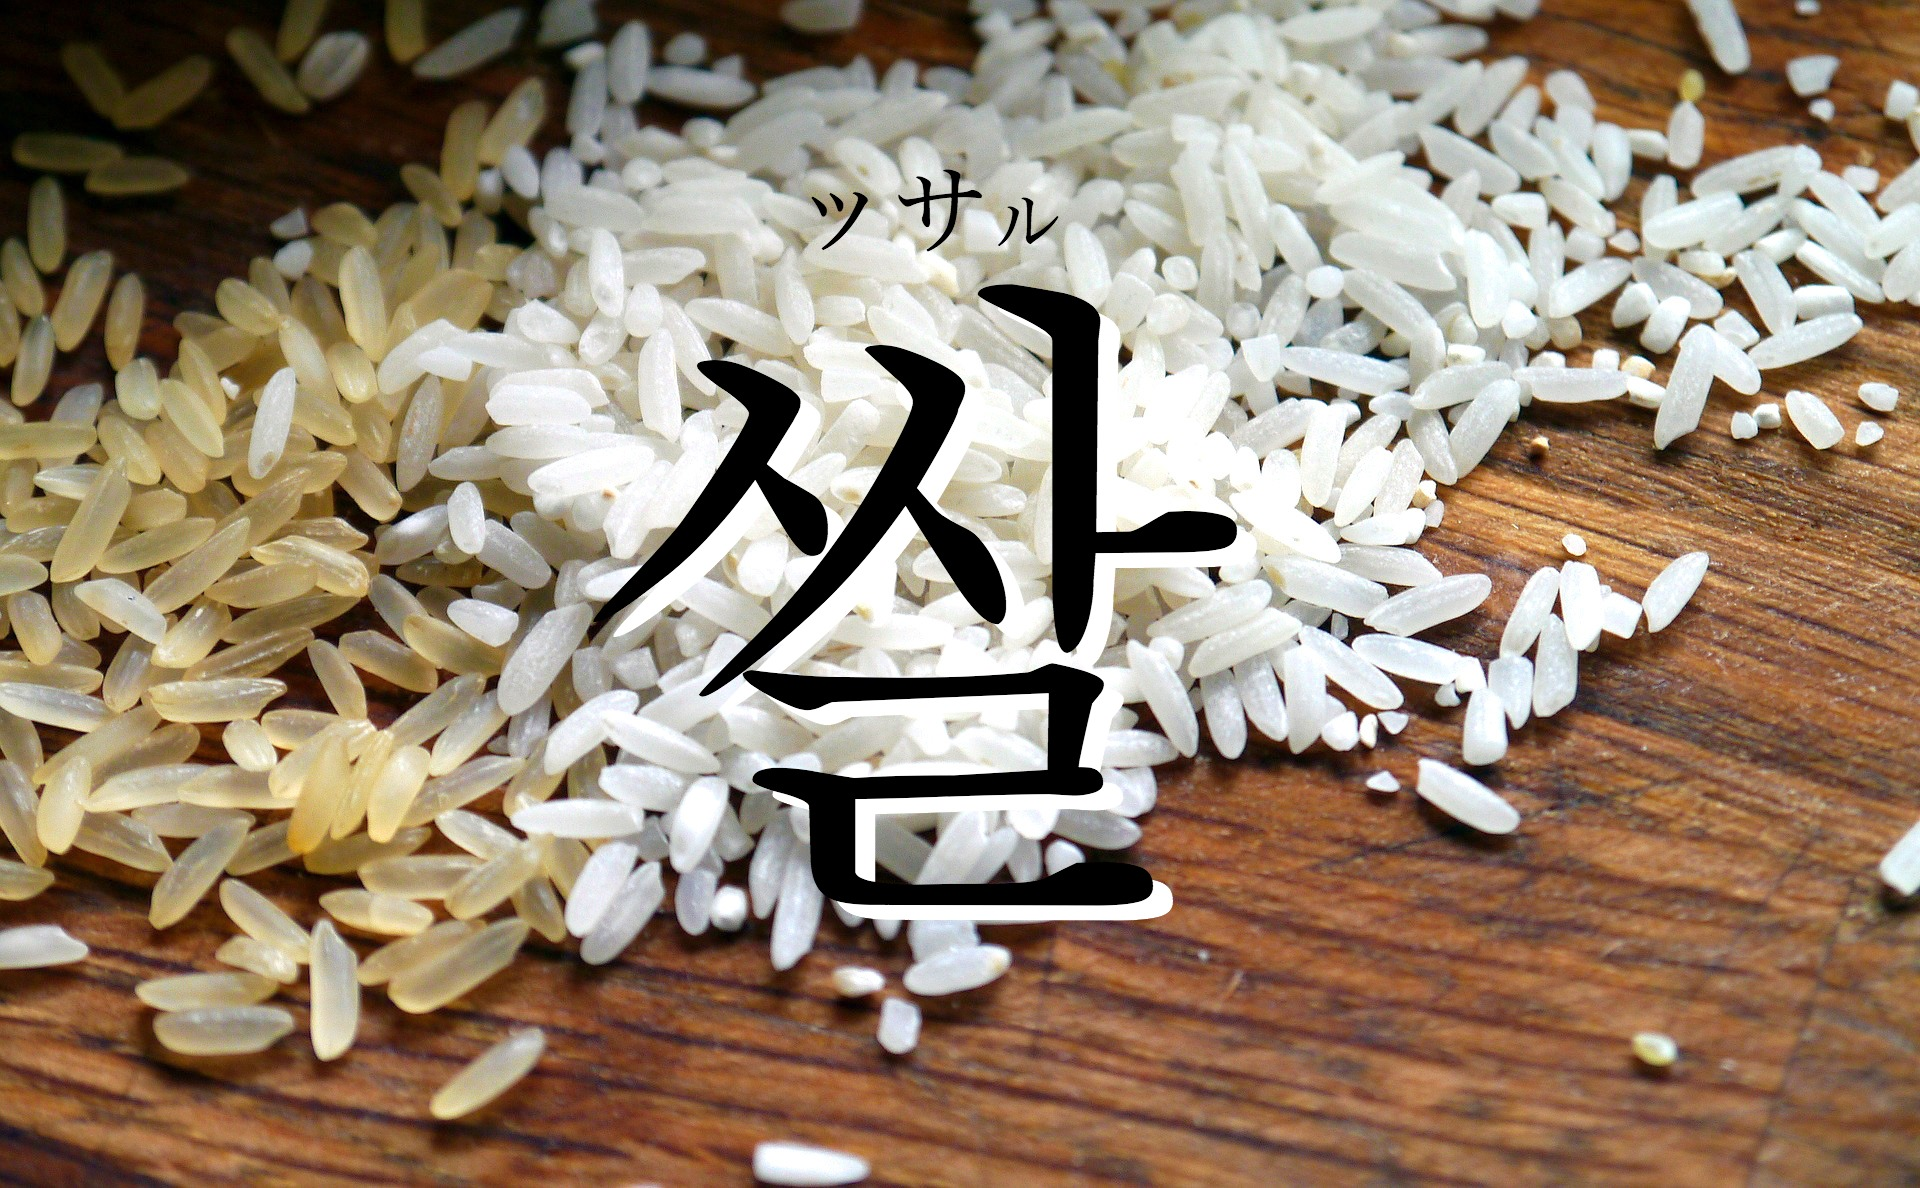 koreanword-rice